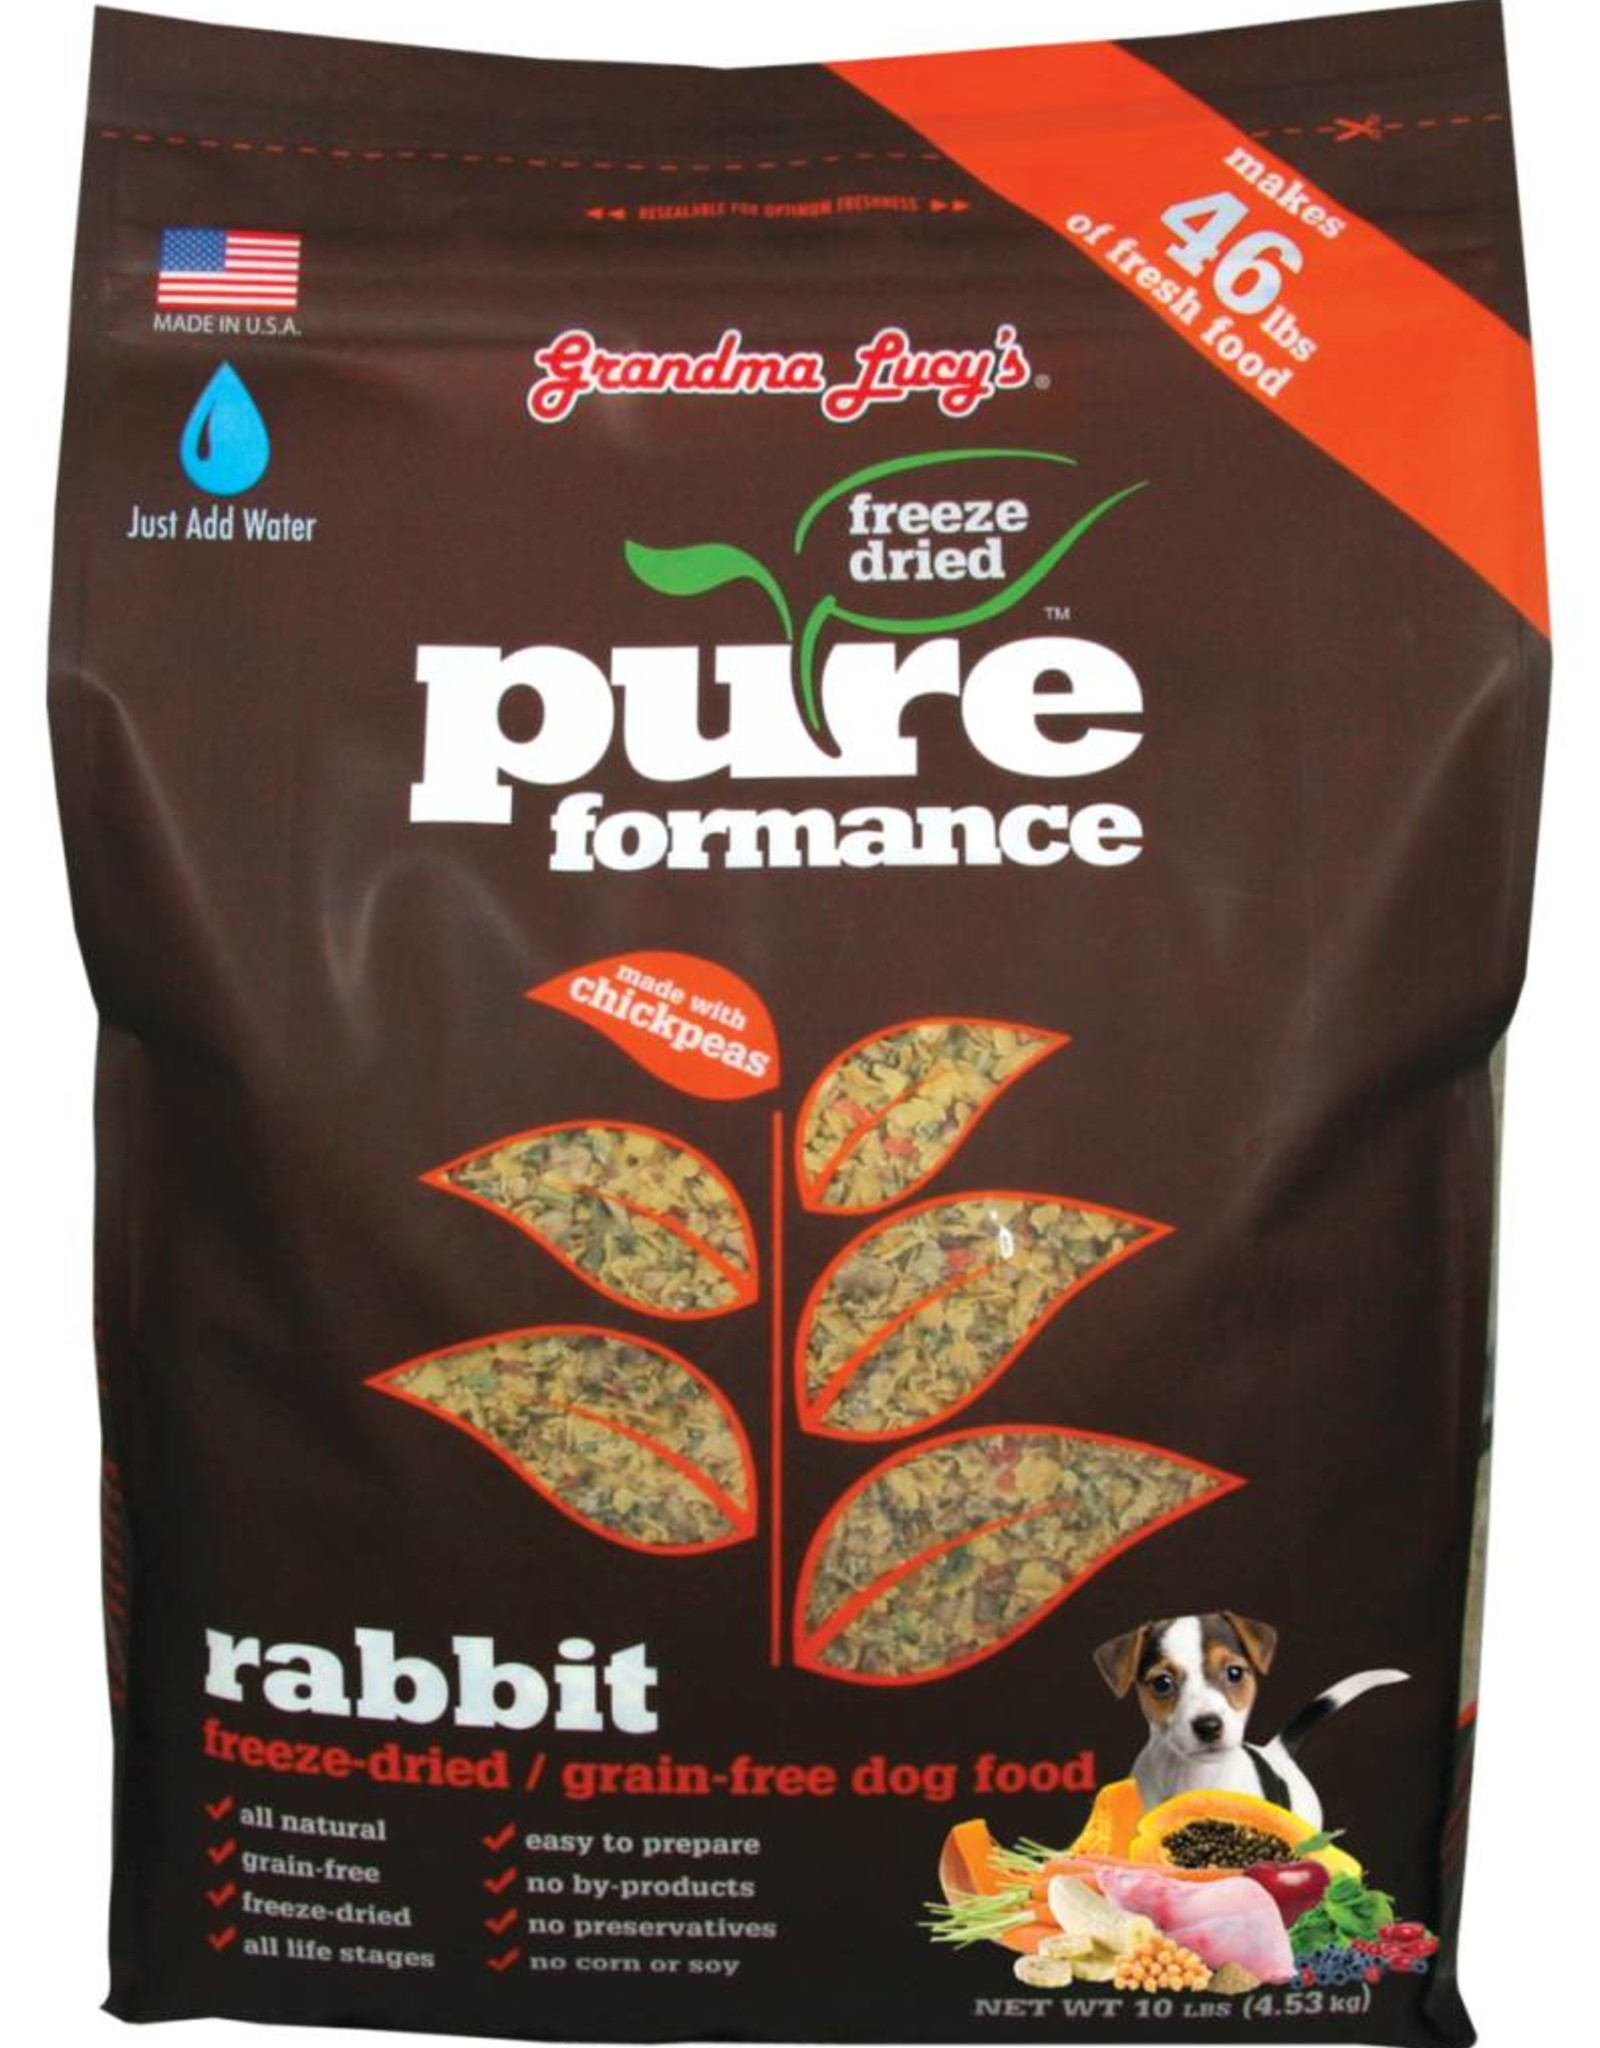 Grandma Lucy's Grandma Lucy's Pureformance Rabbit Formula